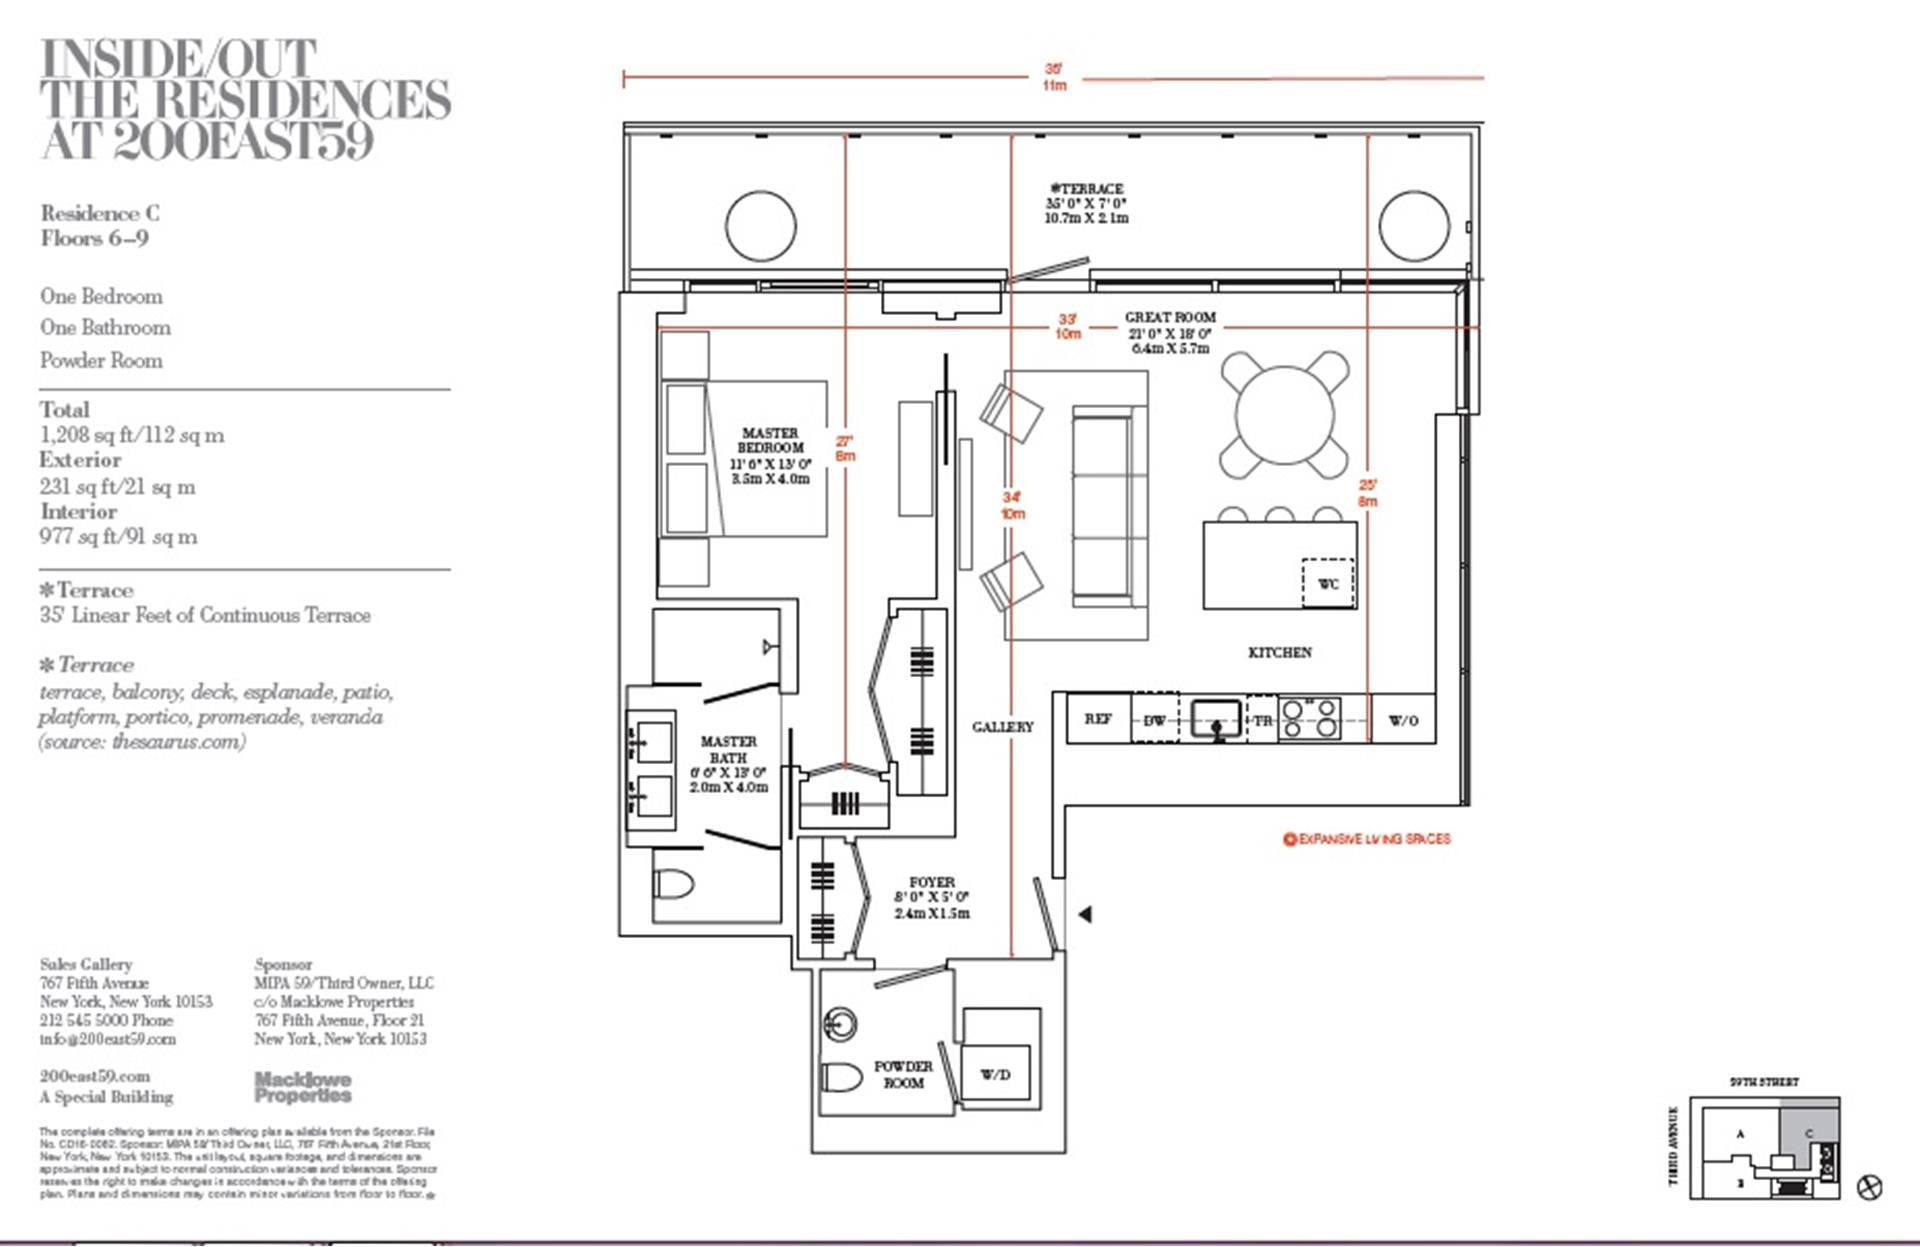 Floor plan of 200 East 59th St, 8C - Midtown, New York